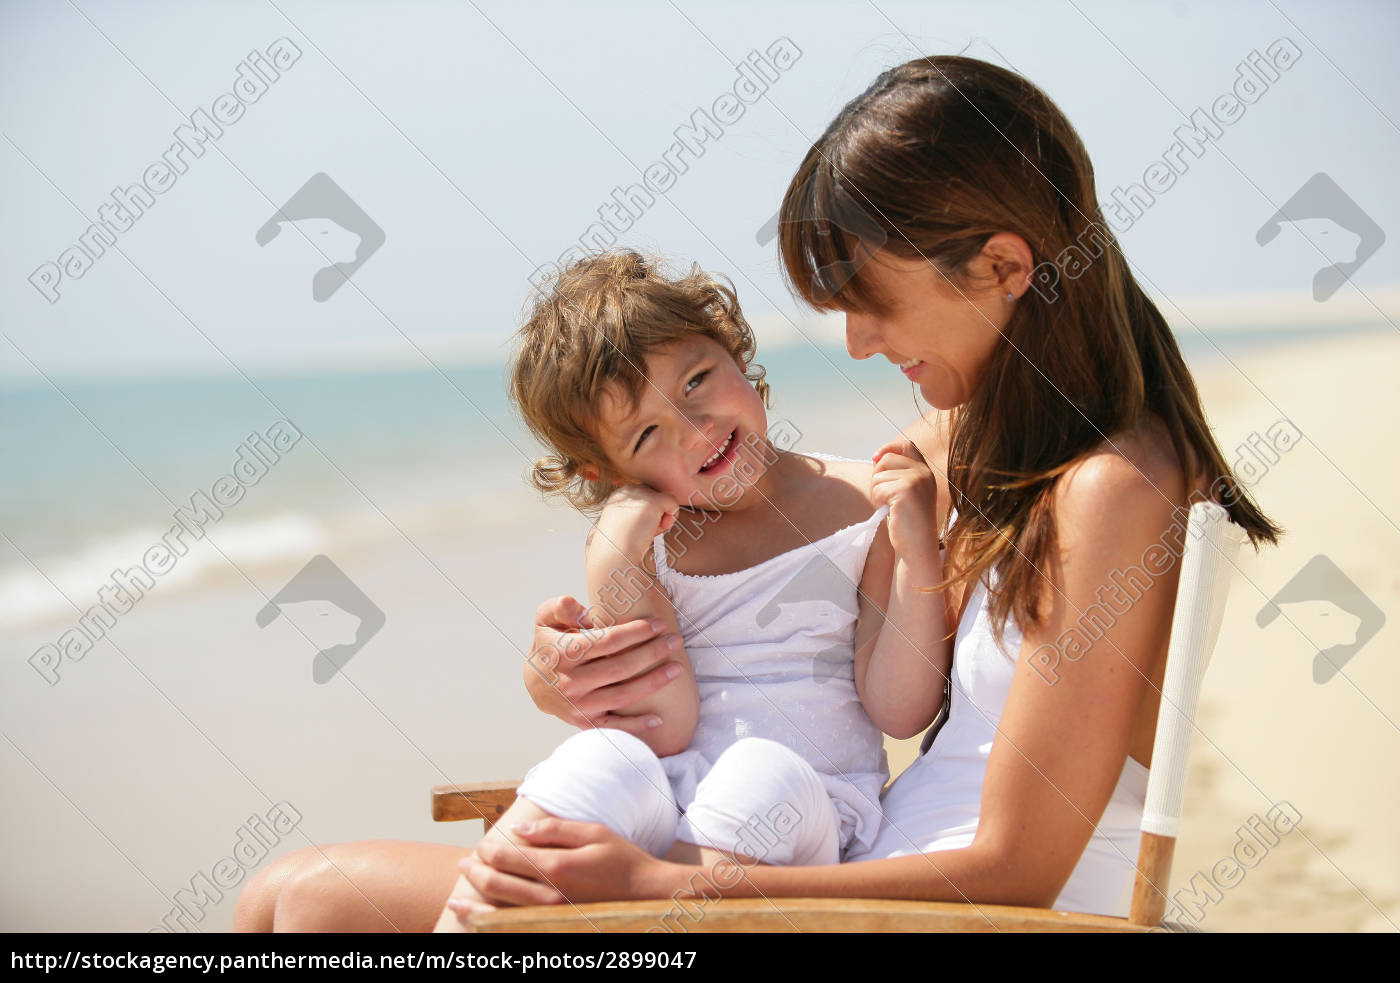 portrait, of, a, little, girl, sitting - 2899047